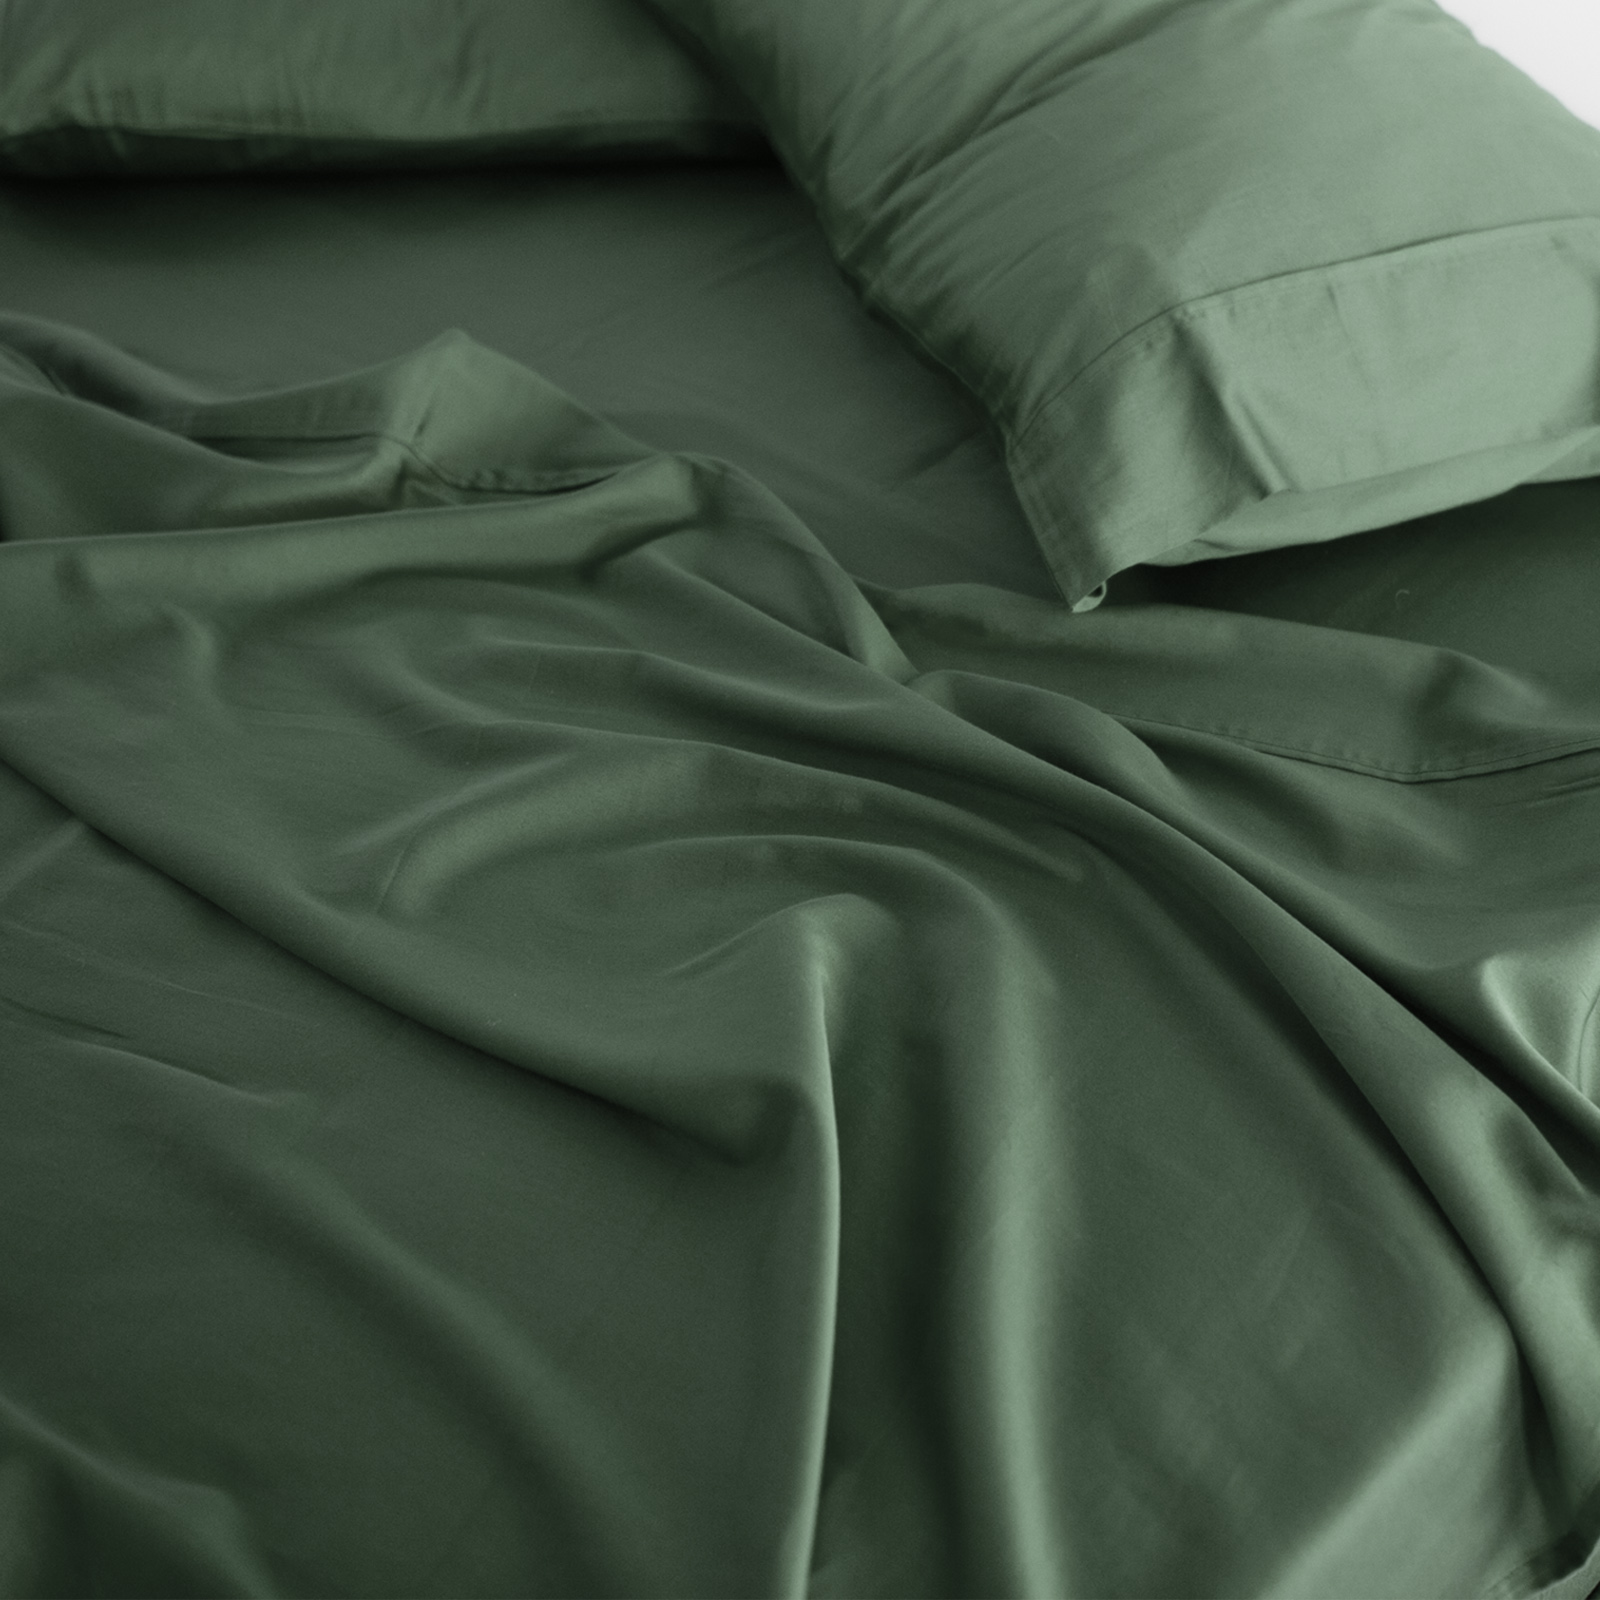 thumbnail 58 - Royal Comfort 1000TC Hotel Grade Bamboo Cotton Sheets Pillowcases Set Ultrasoft